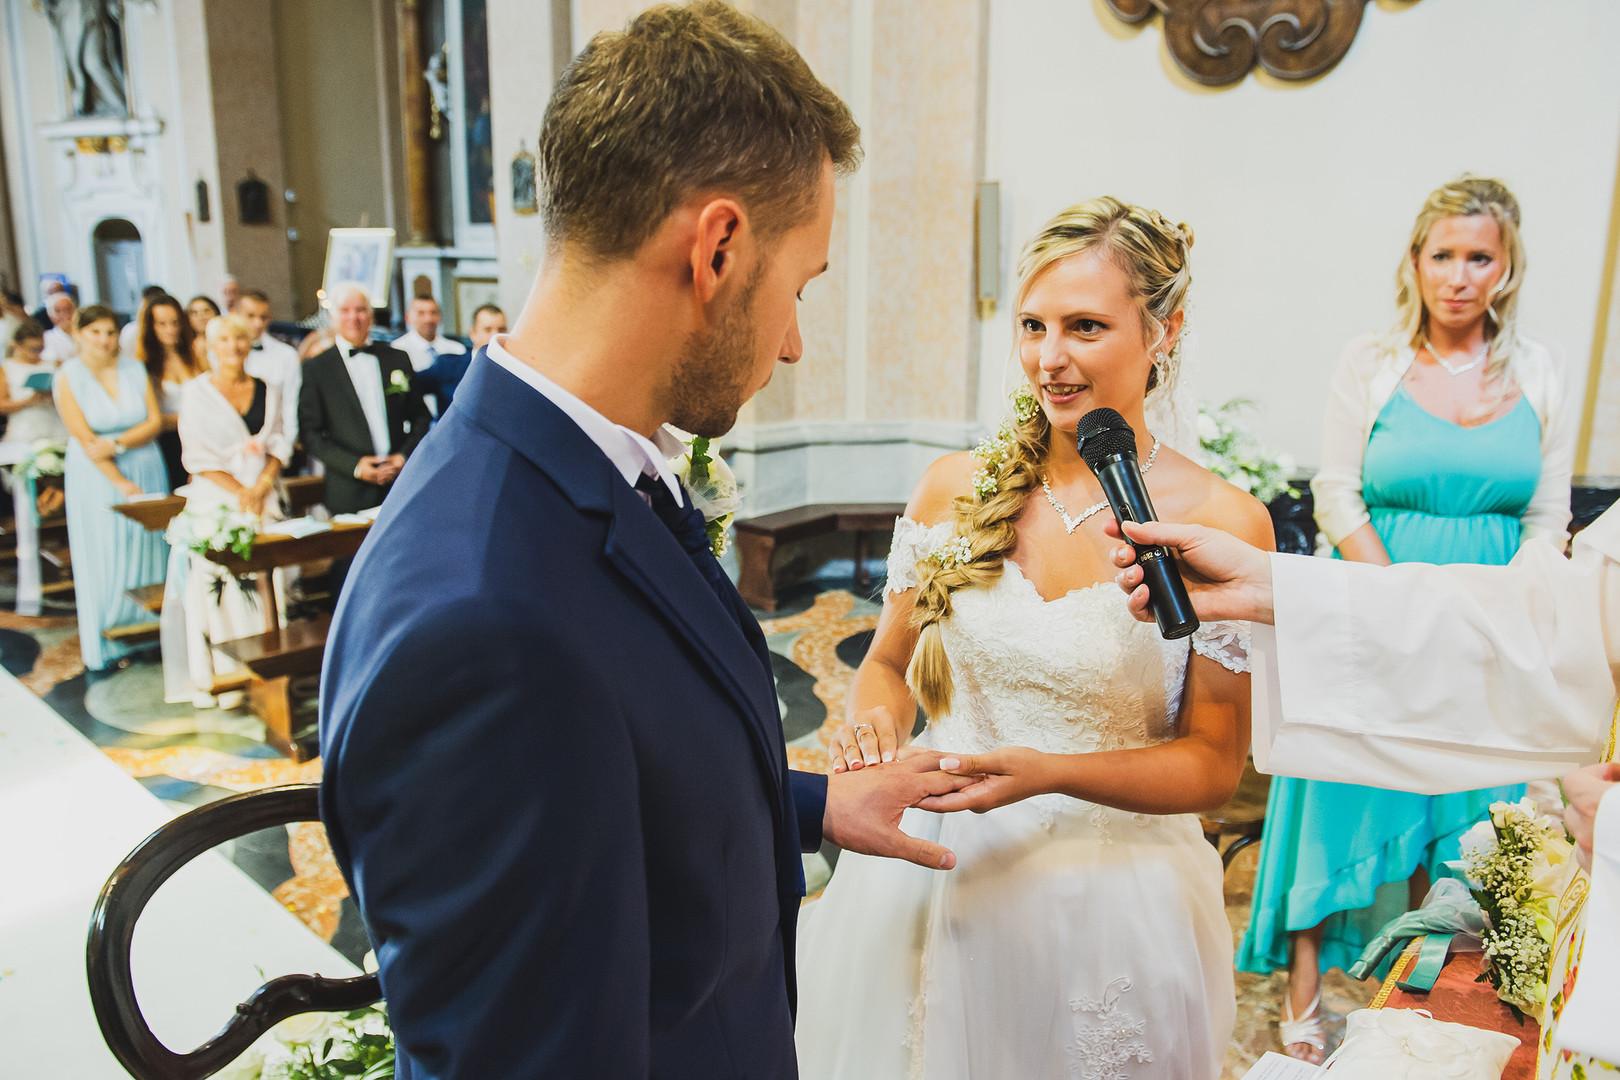 2019.08.24_Matrimonio_Nicole_Davide_0056